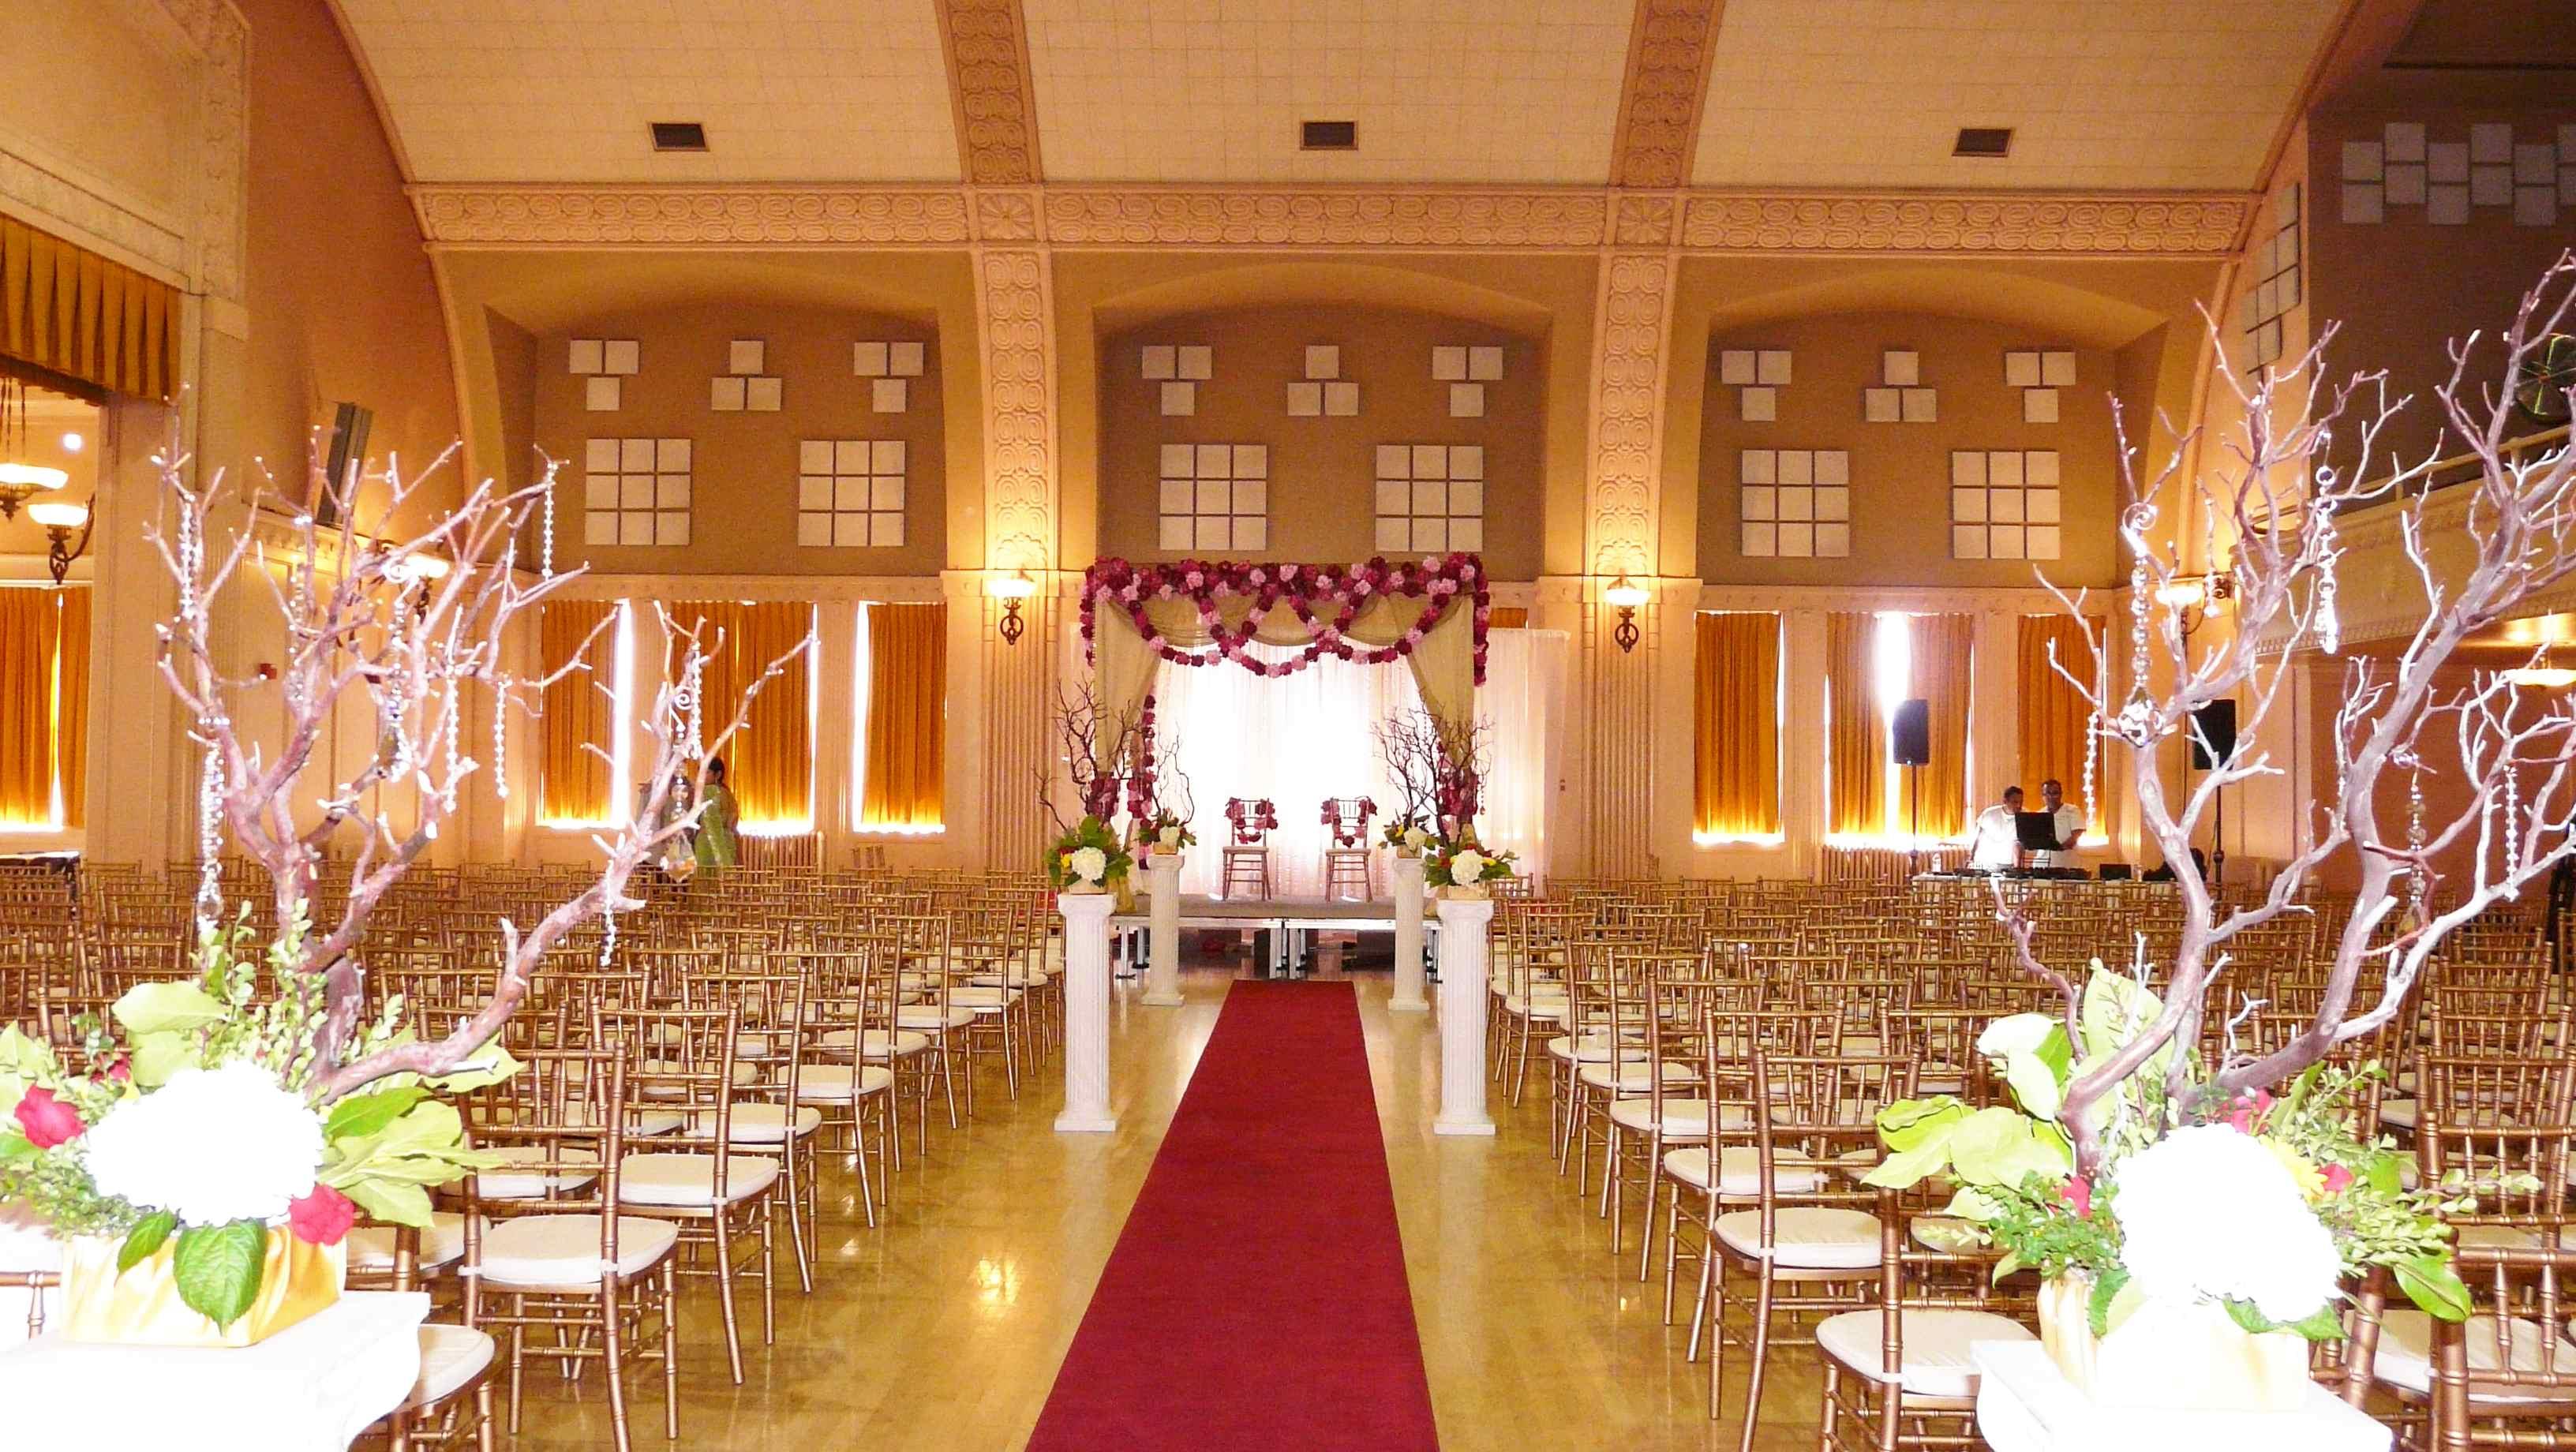 Kamlesh Amp Nisha Altan Gallery Wedding Amp Event Design